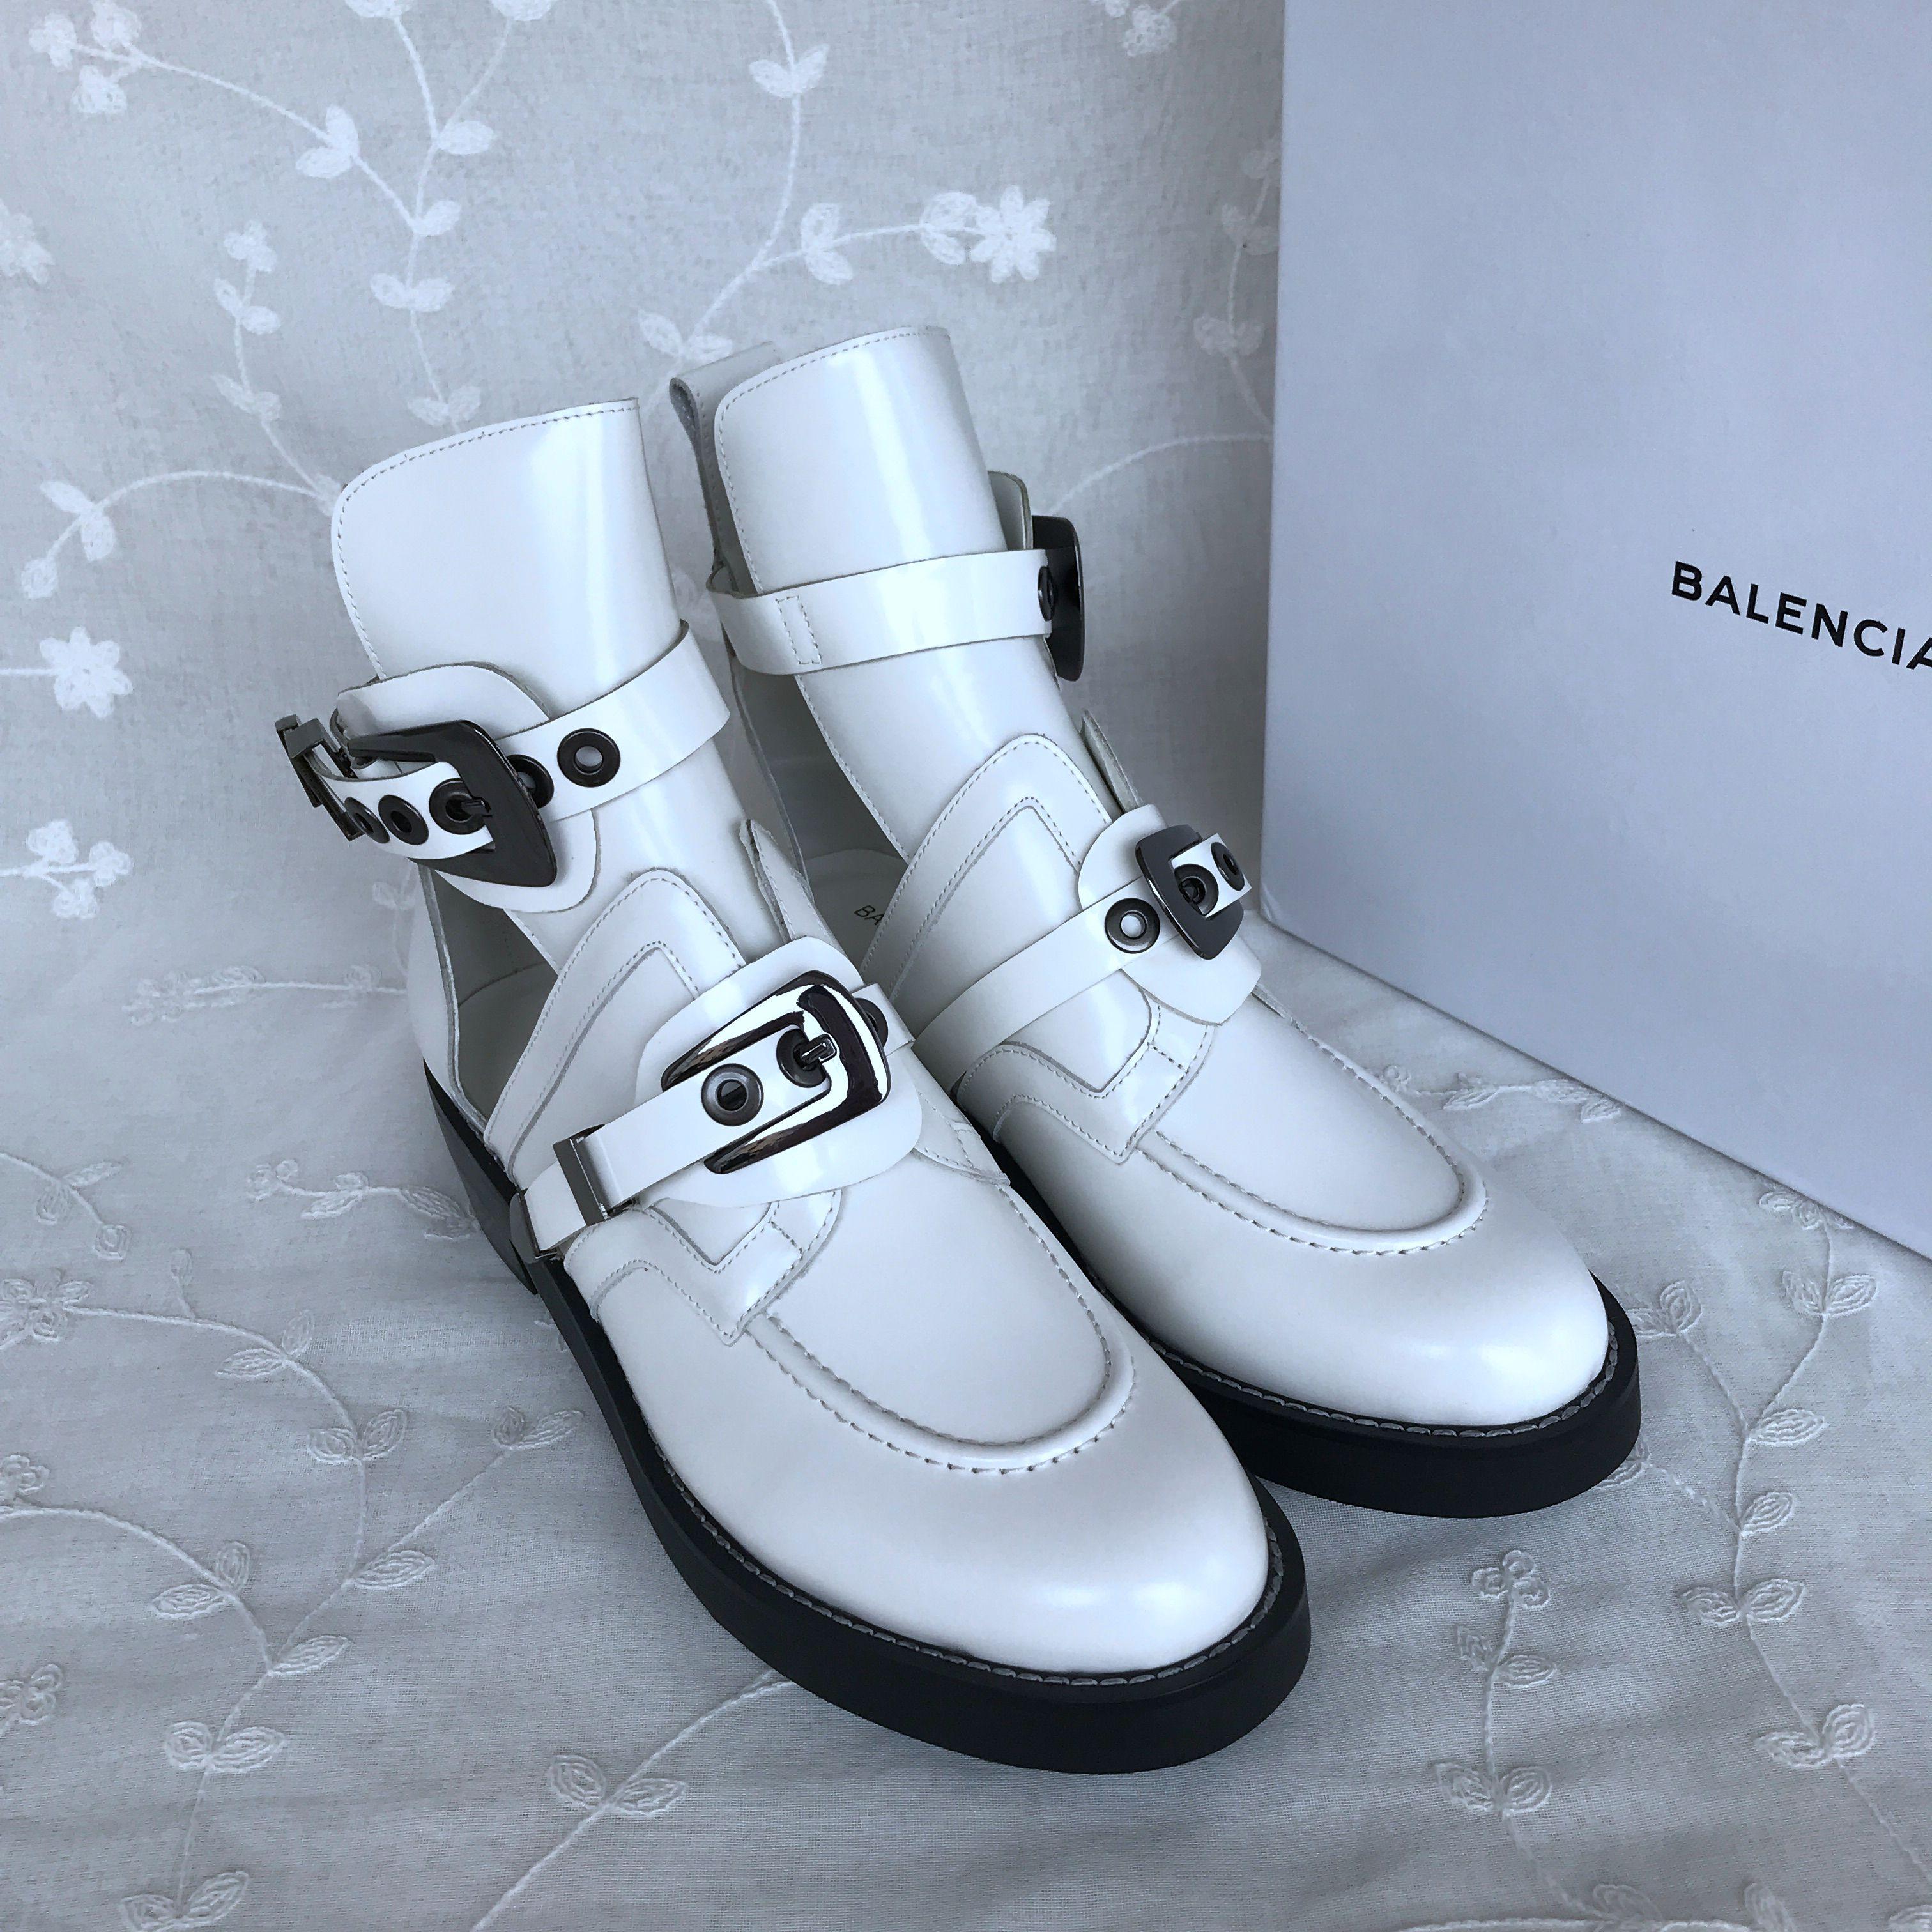 BALENCIAGA leather shoes 832967